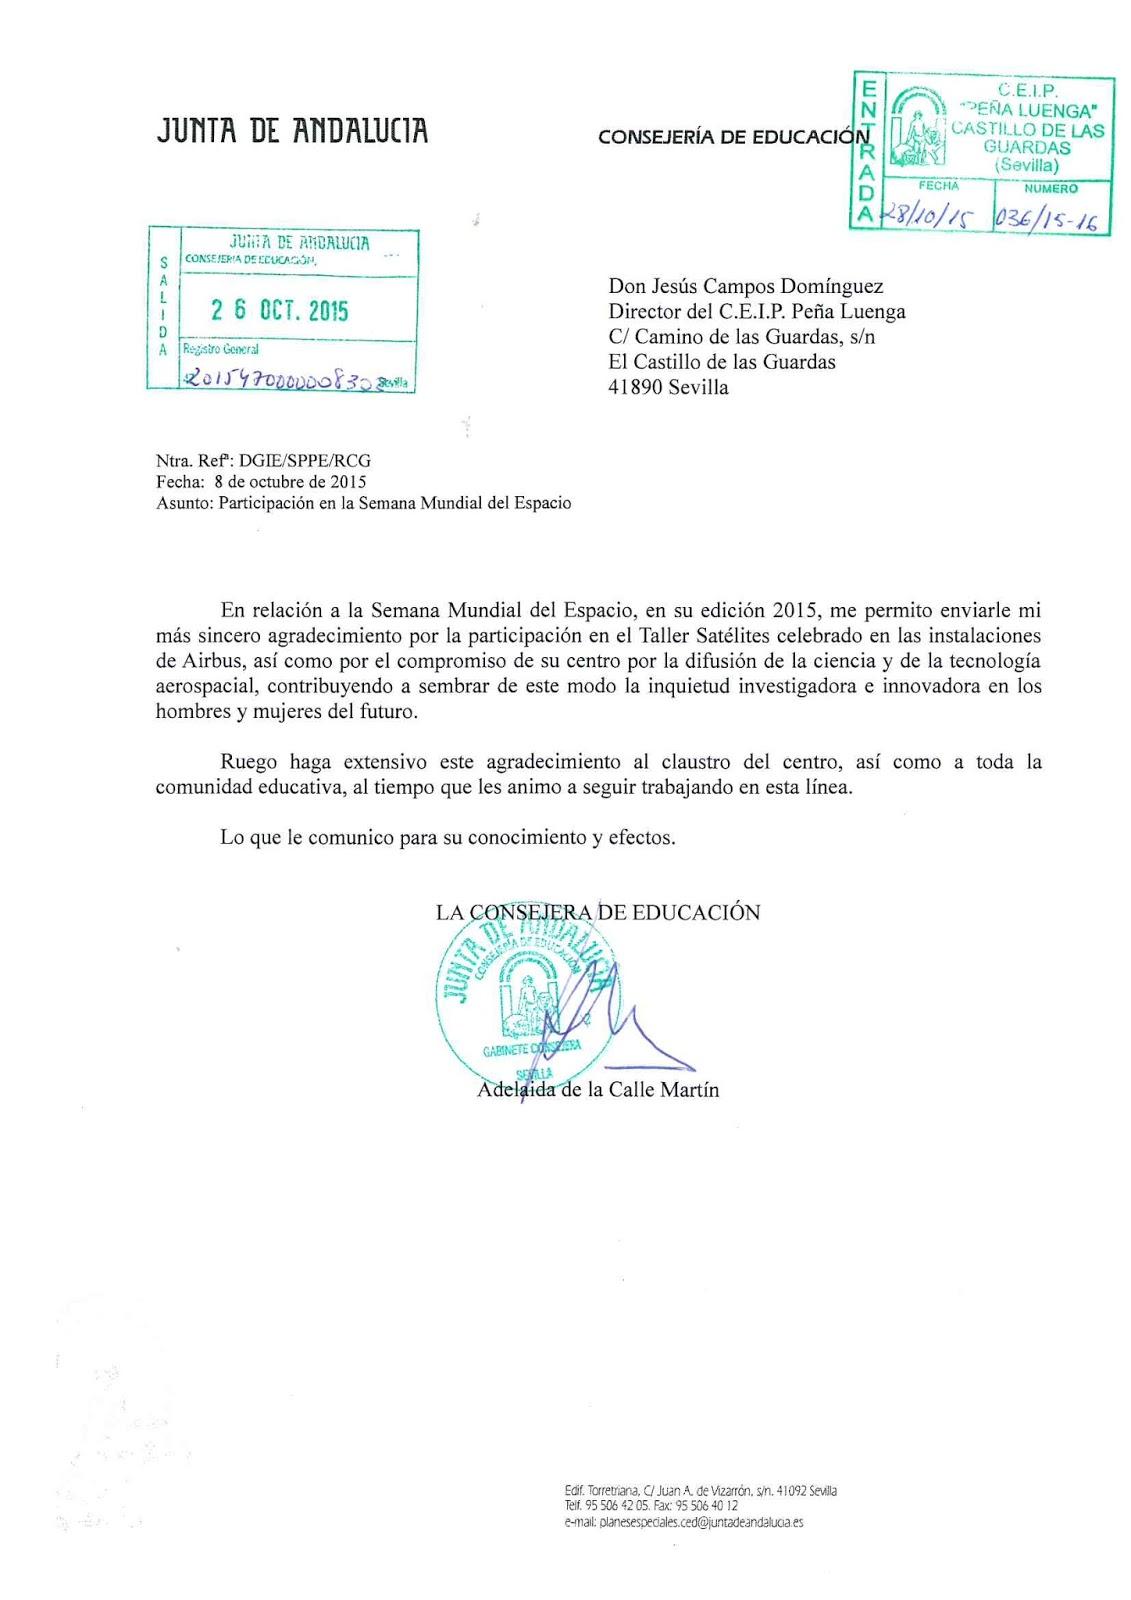 C p pe aluenga do a adelaida de la calle consejera de for Consejeria de educacion junta de andalucia